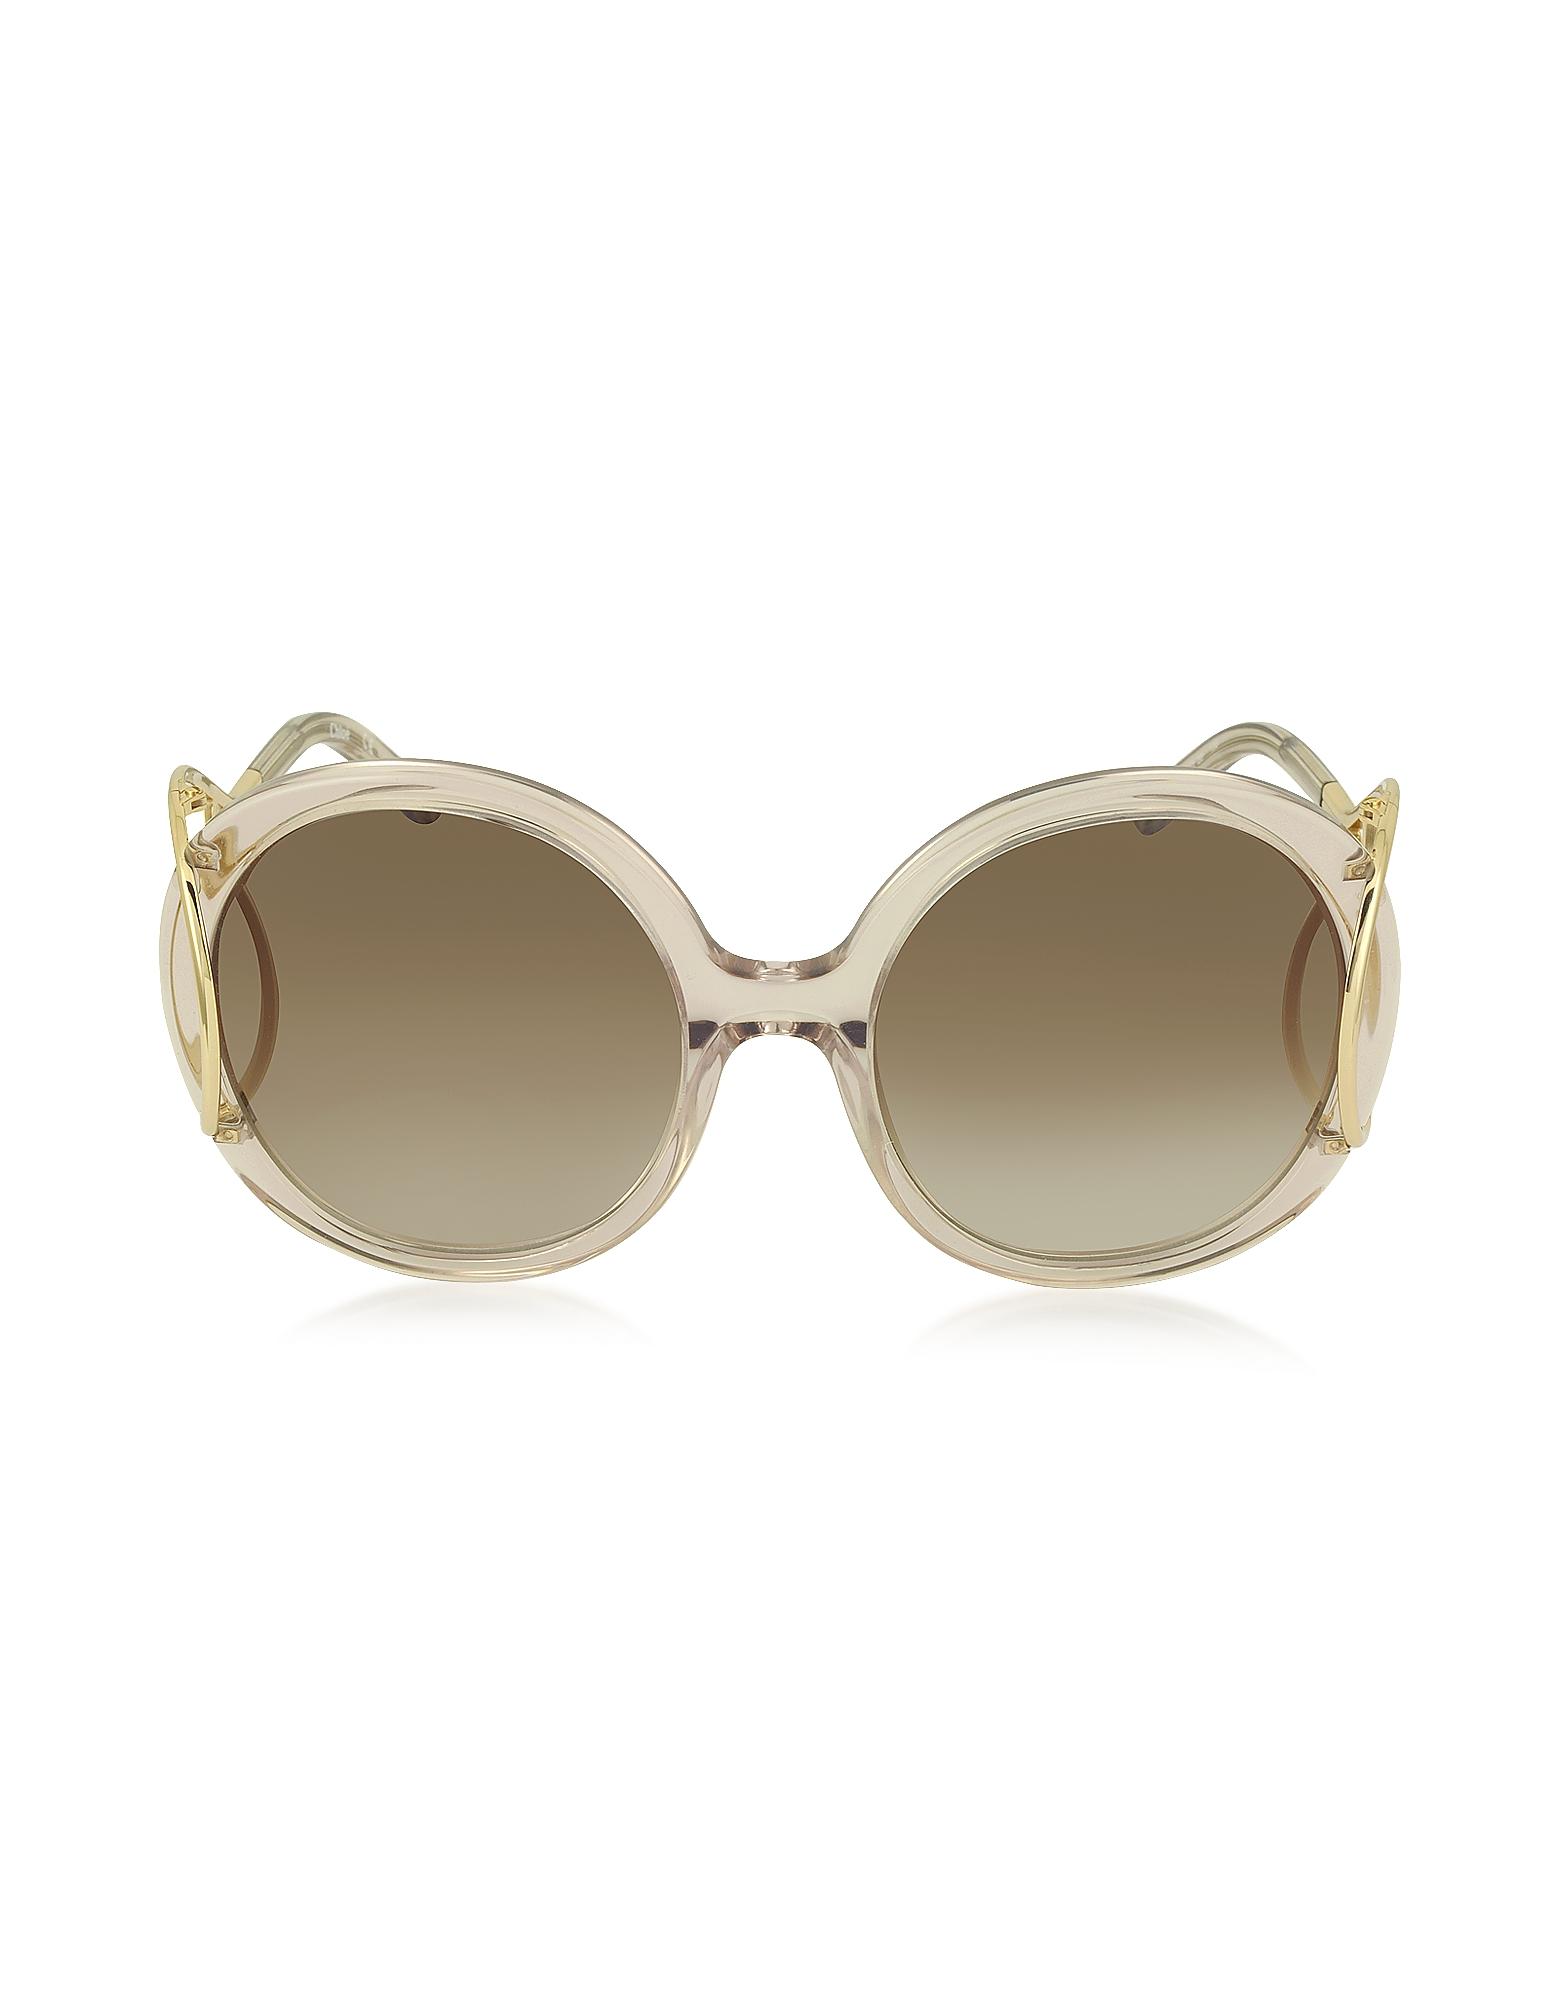 Chloe Sunglasses, JACKSON CE 703S Large Round Acetate and Metal Women's Sunglasses